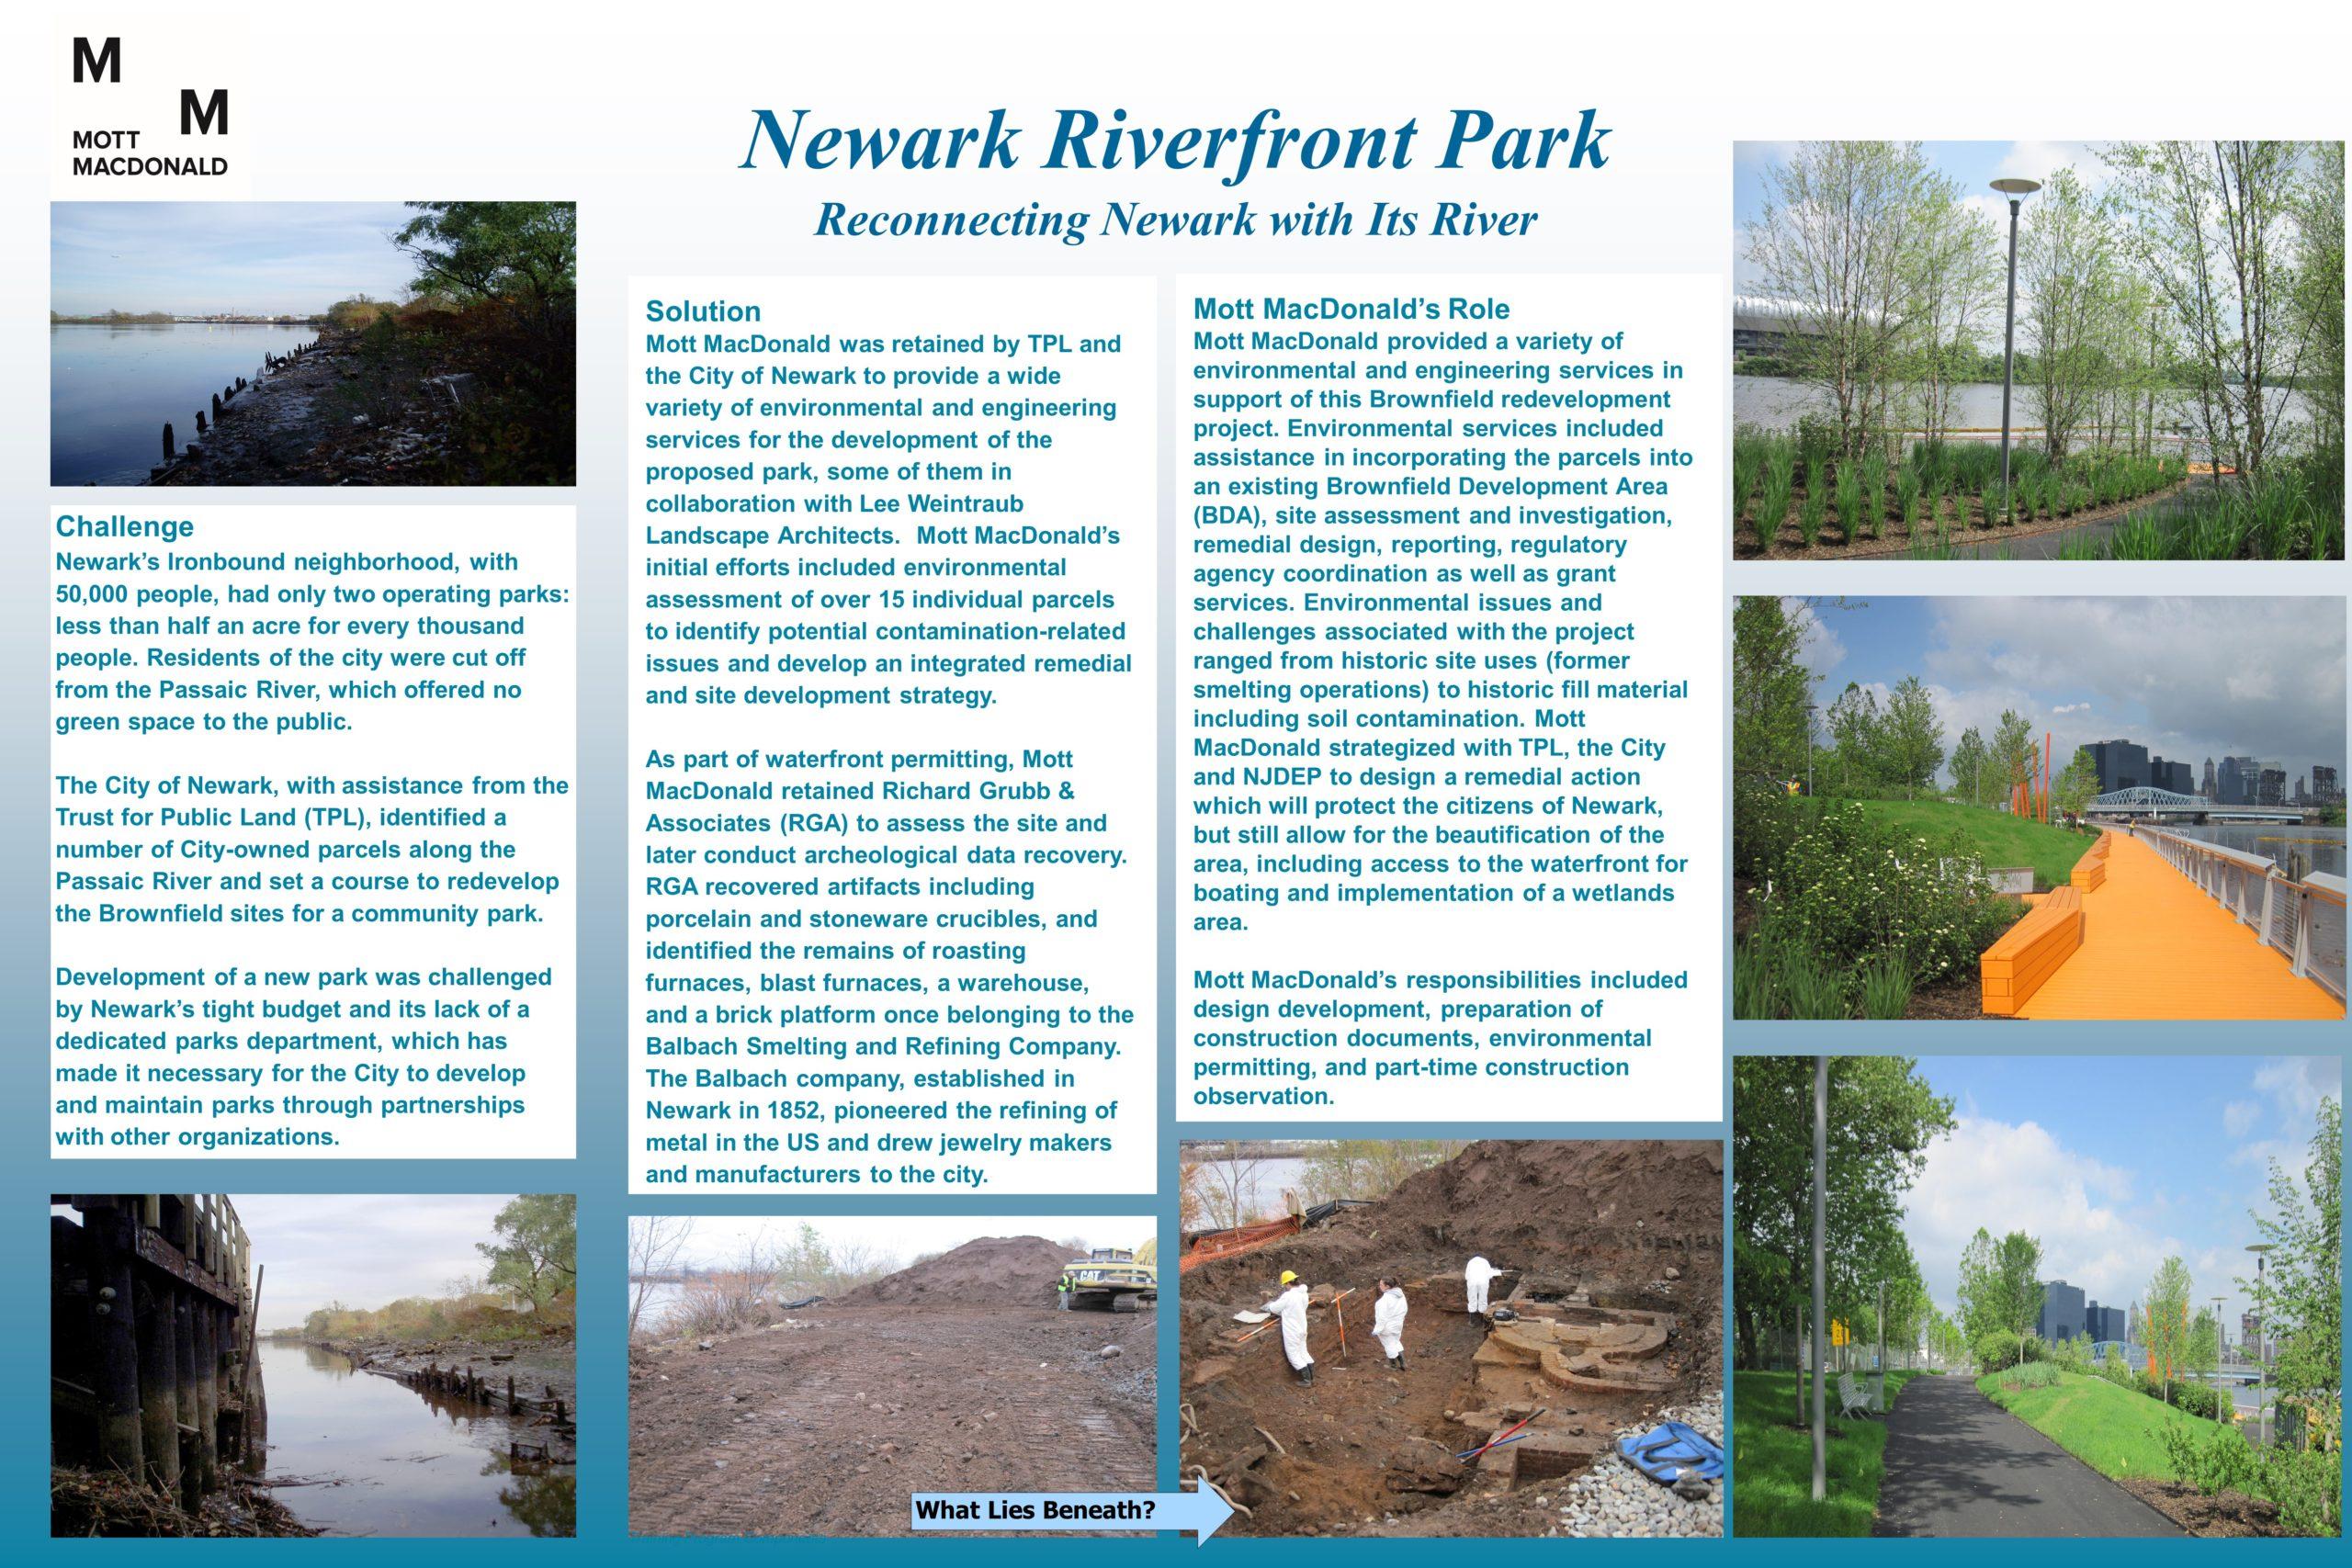 newark riverfront park